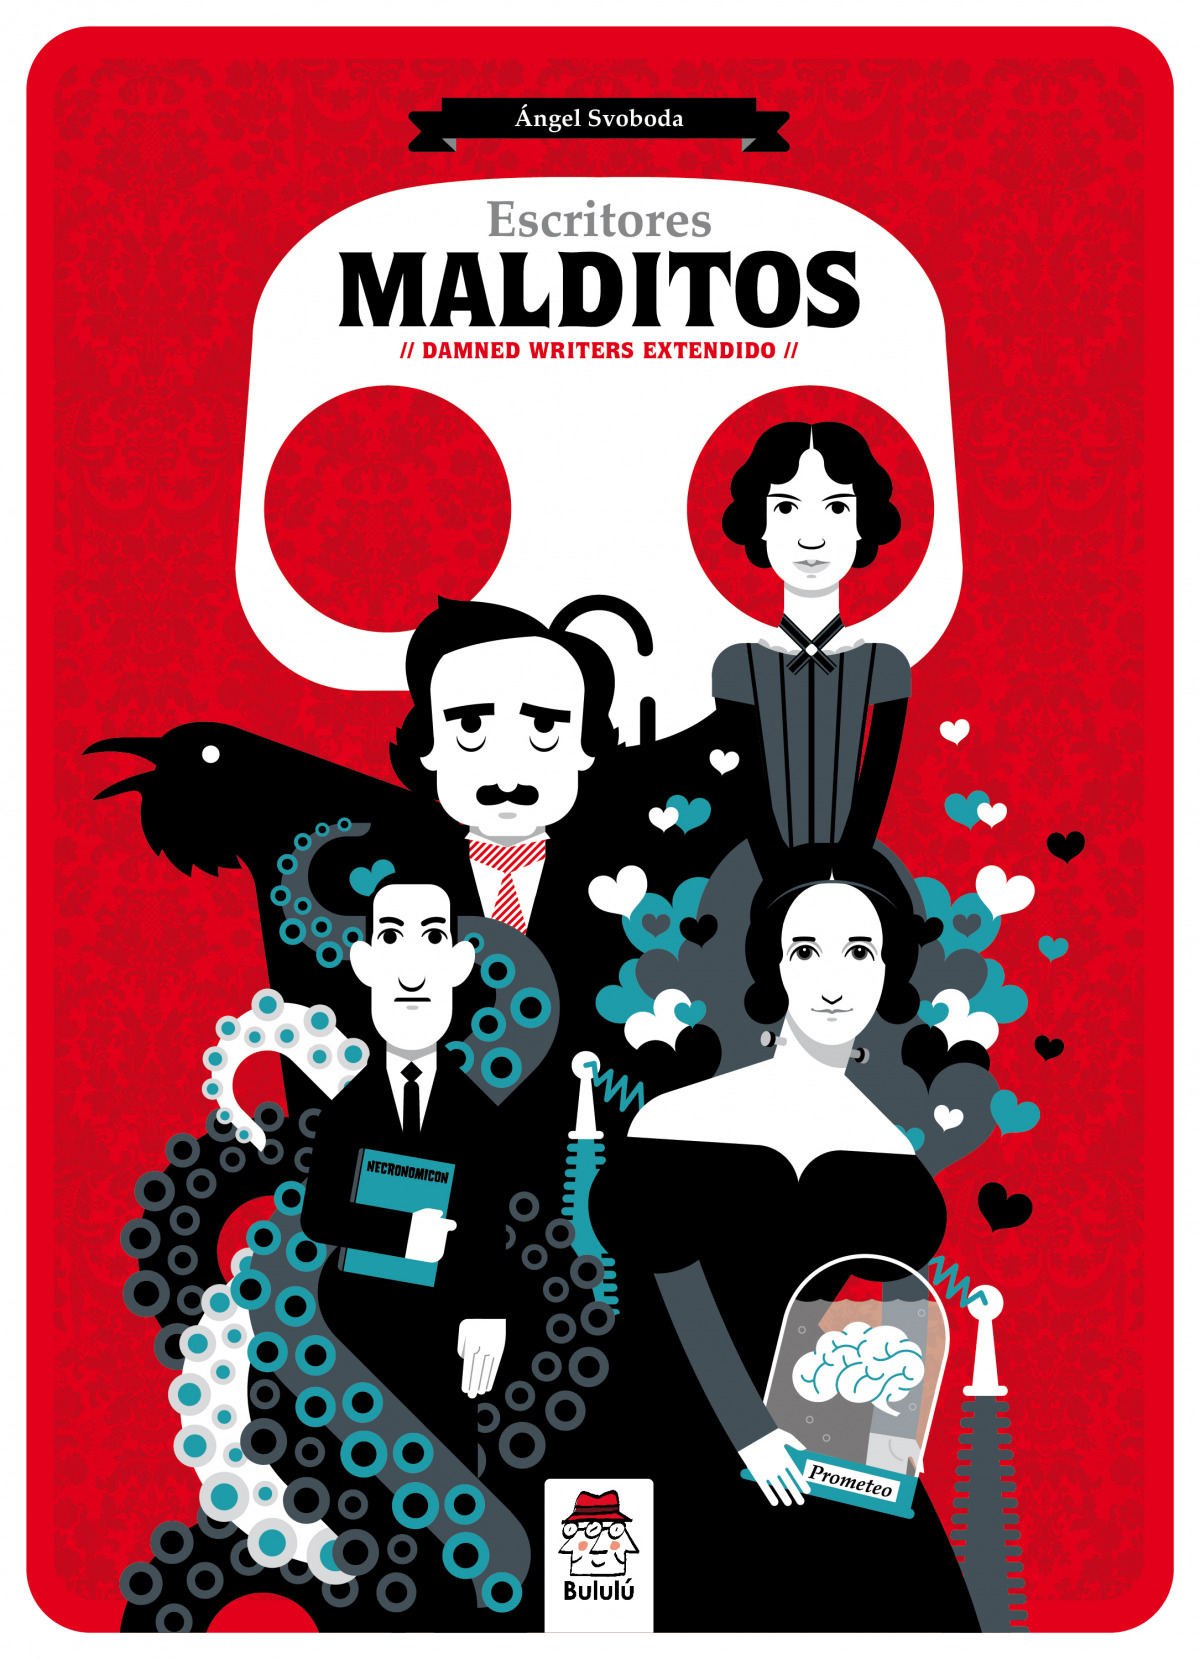 ESCRITORES MALDITOS (DAMNED WRITERS EXTENDIDO)